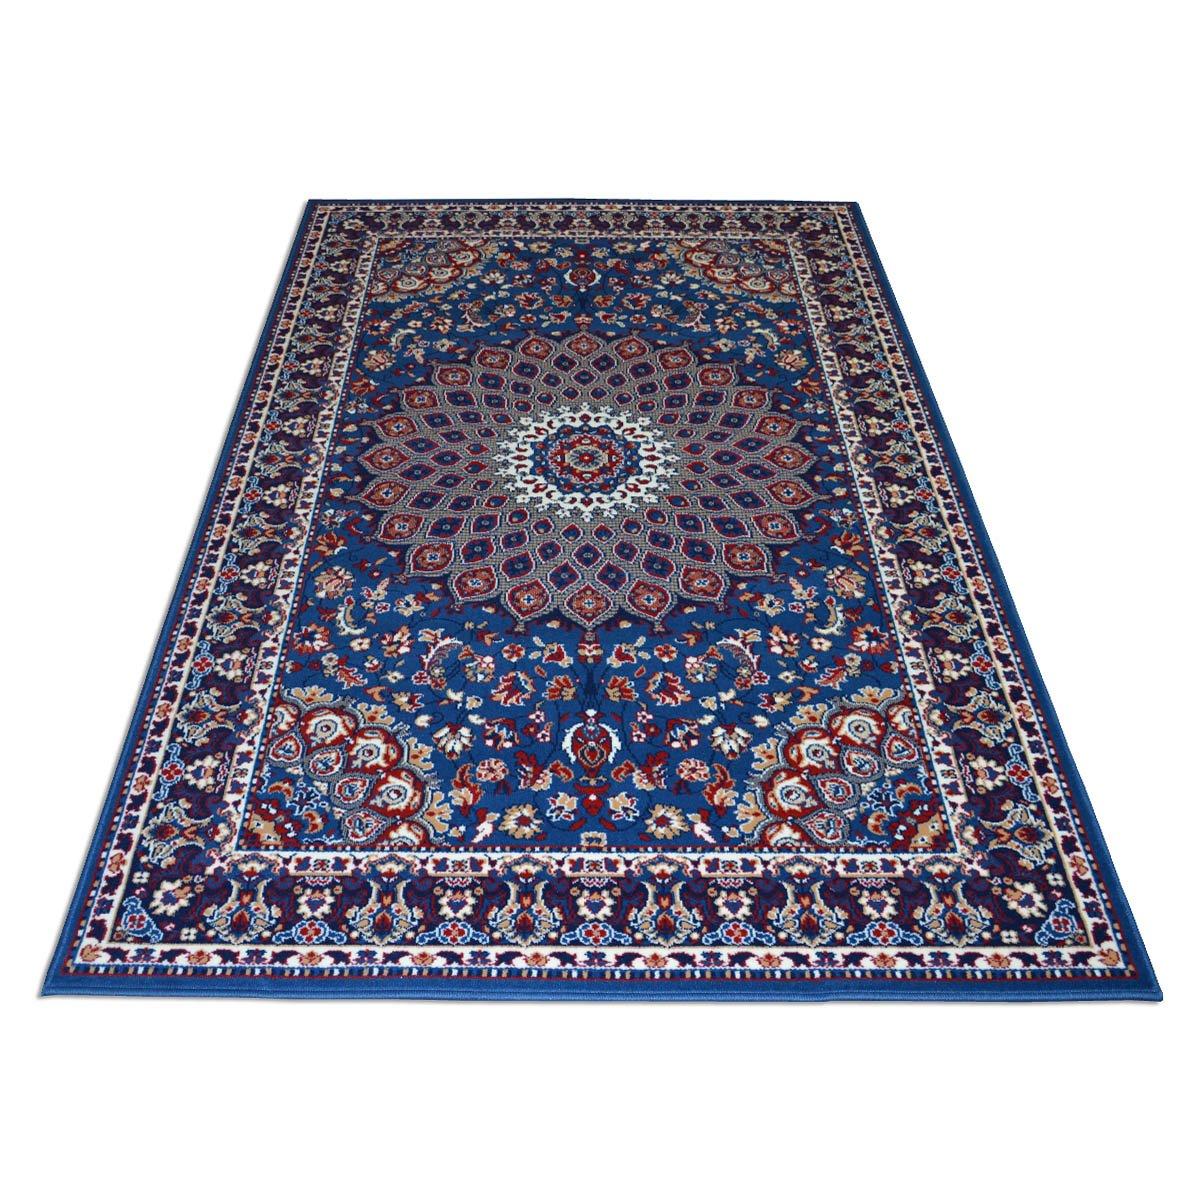 WEBTAPPETI.IT Teppich Economy Stil Perserteppich Klassisch Blau Royal Shiraz 2082-LIGHT Blau cm. 160x230 blau